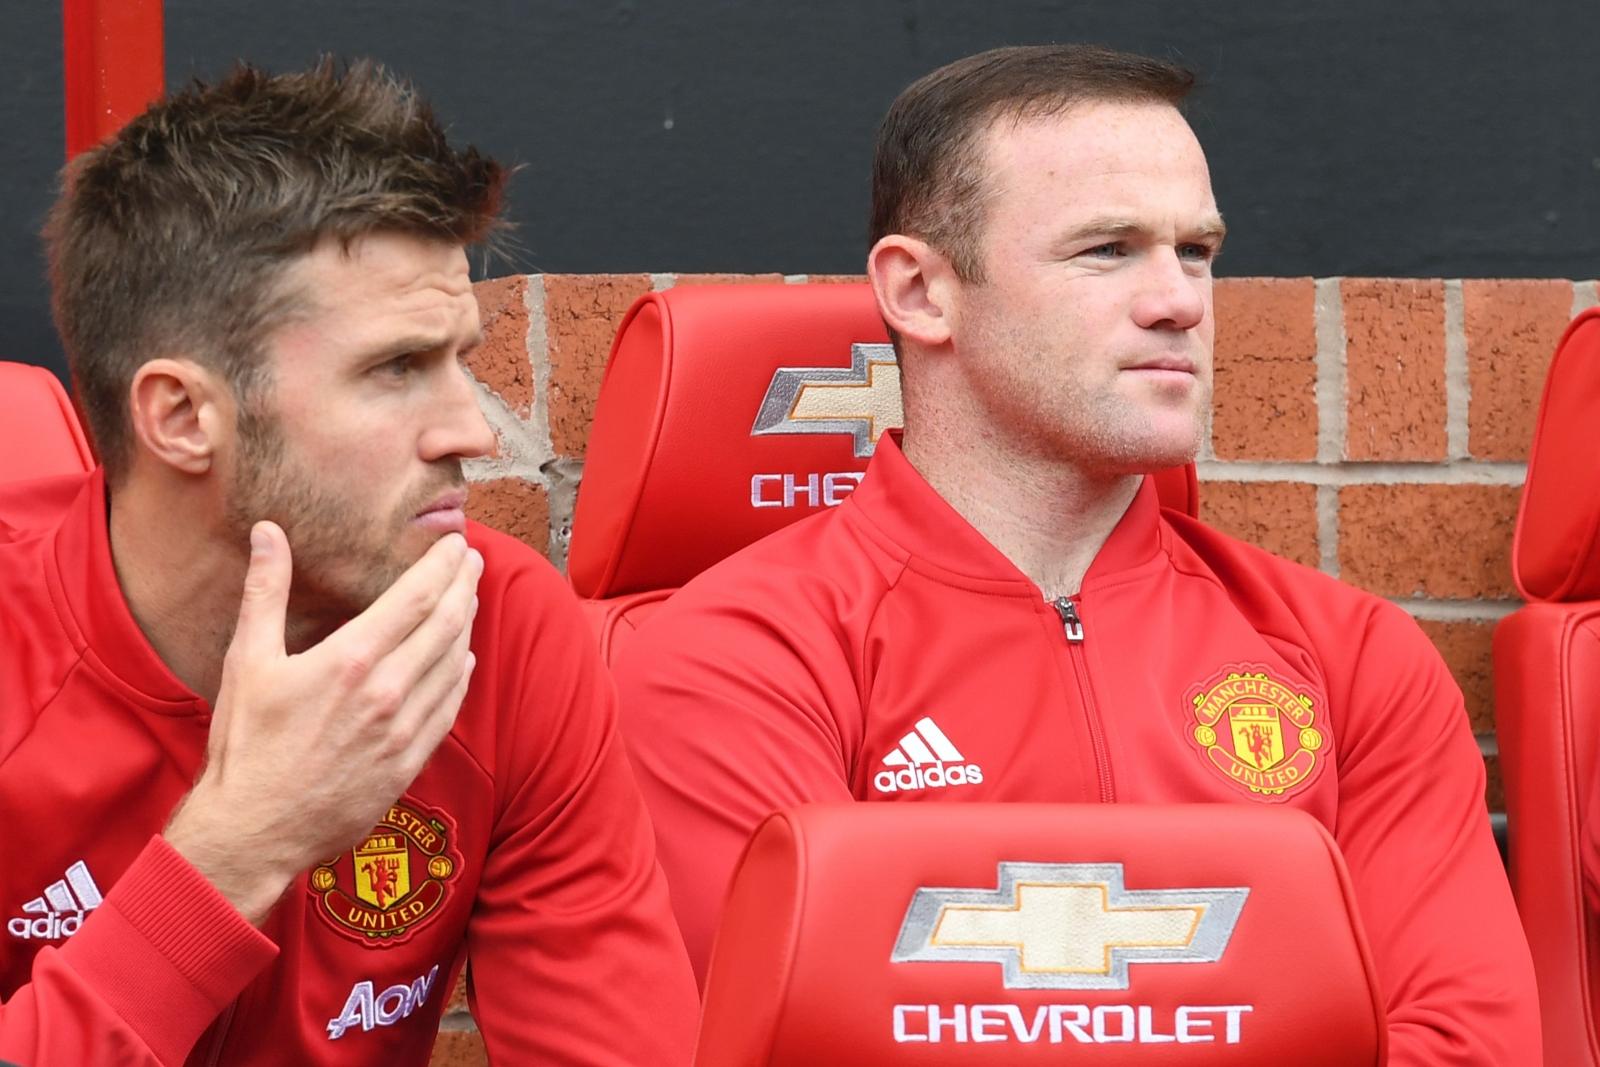 Michael Carrick and Wayne Rooney